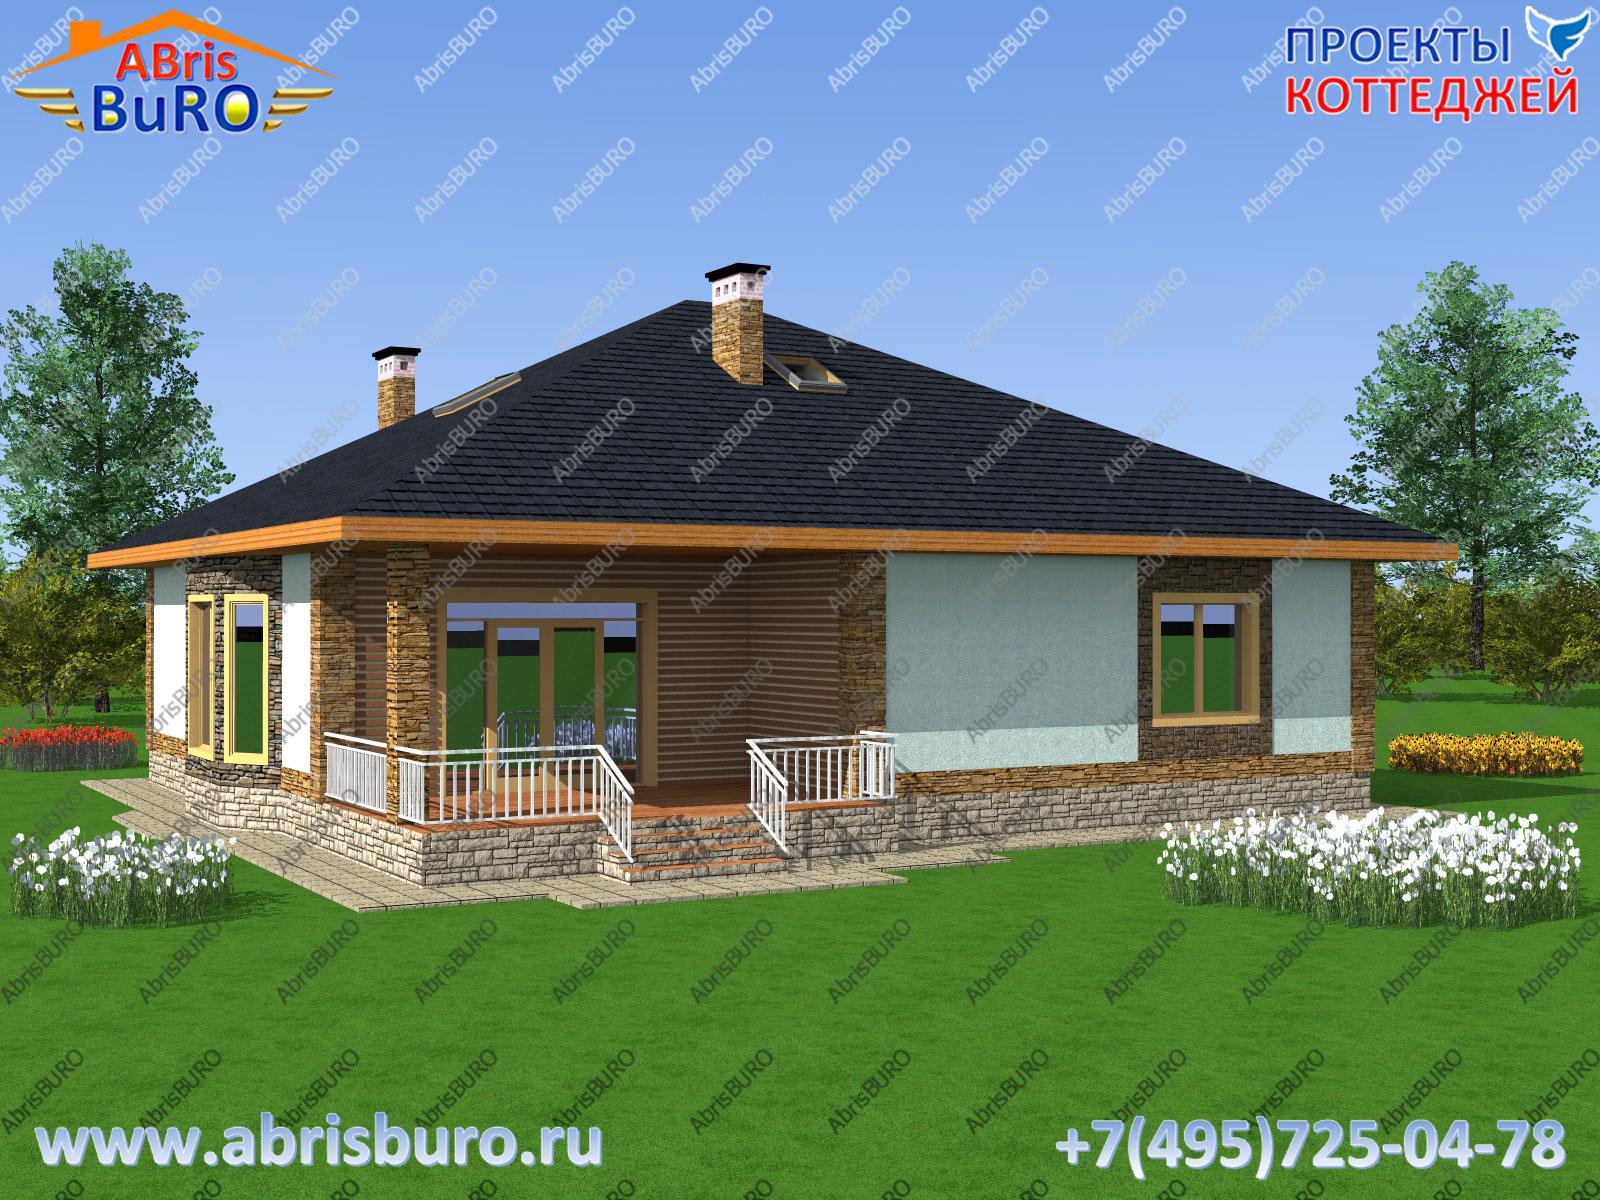 Фасад дома 3d K2092-218